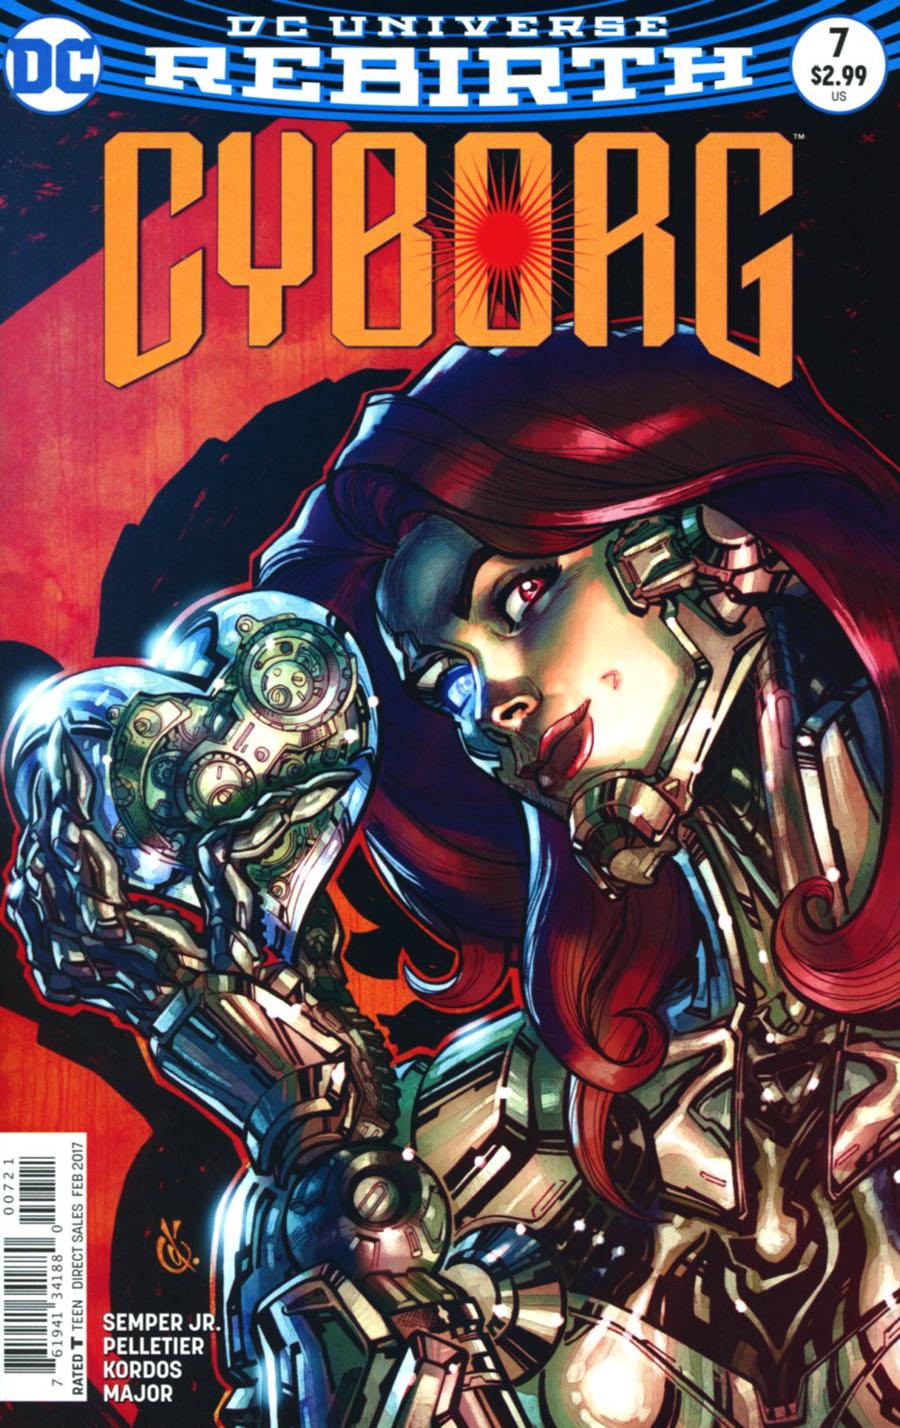 Cyborg Vol 2 #7 Cover B Variant Carlos DAnda Cover